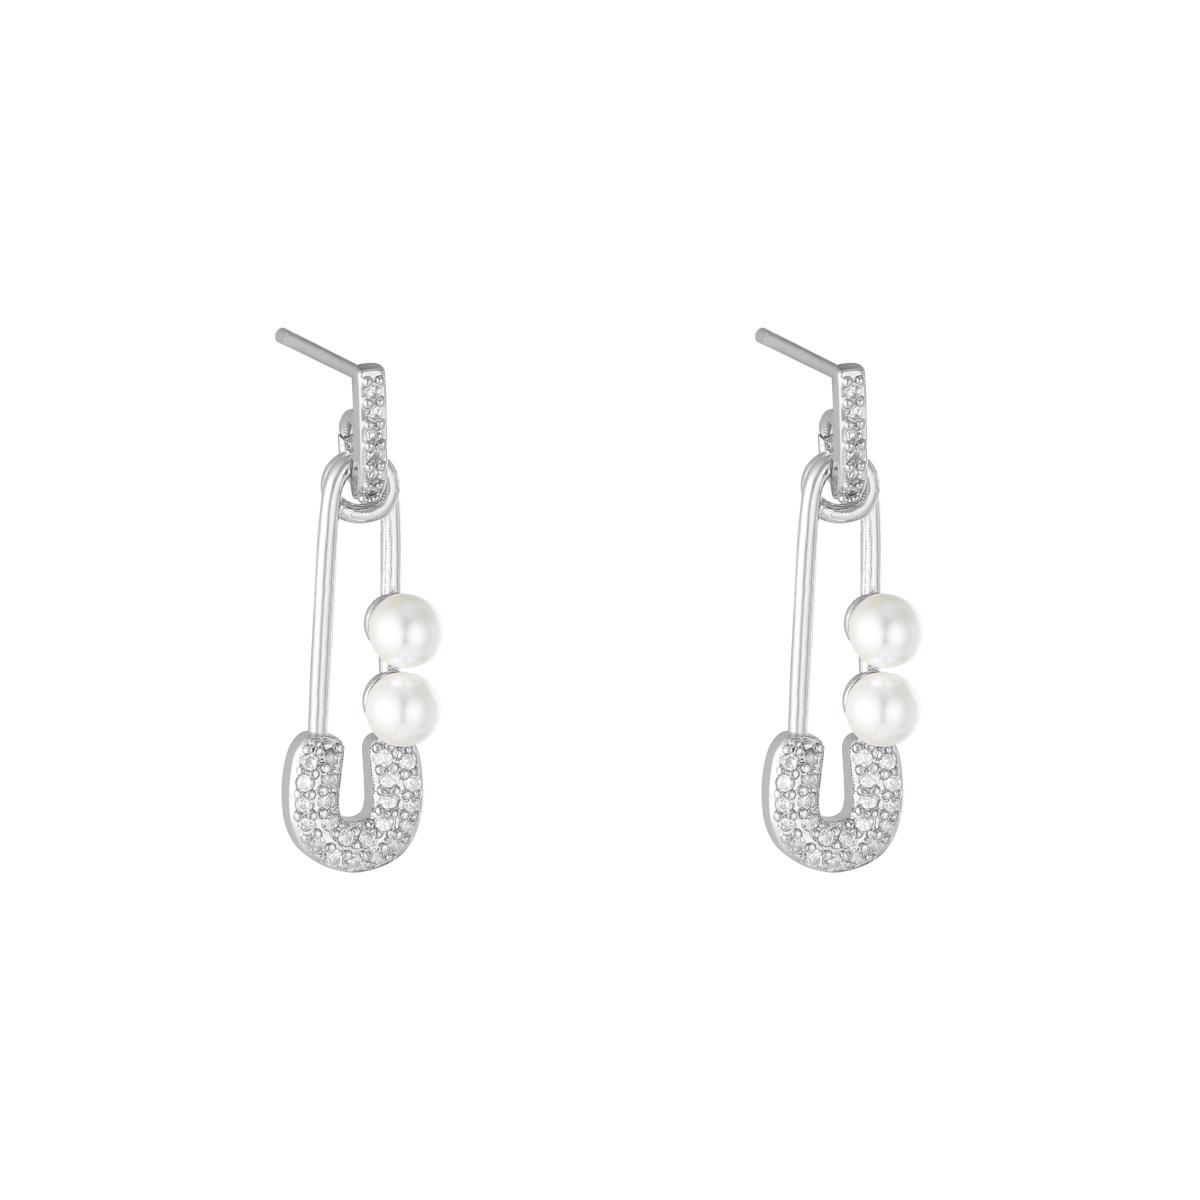 Boucles d'oreilles Glamour Pin